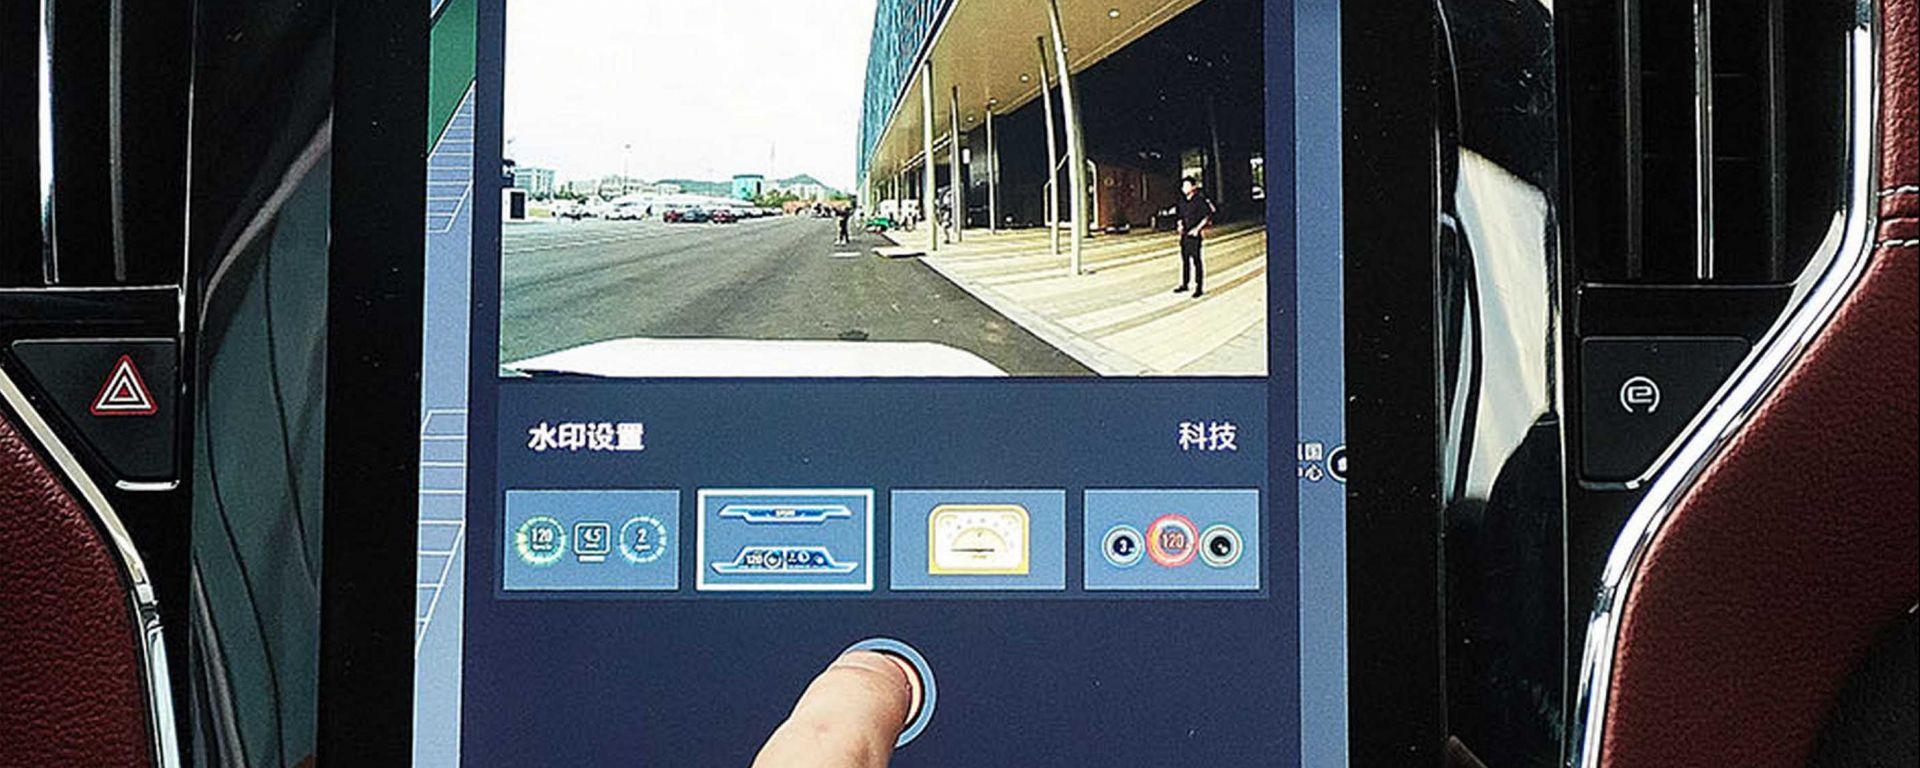 OS'Car: l'infotaiment di Alibaba per l'auto